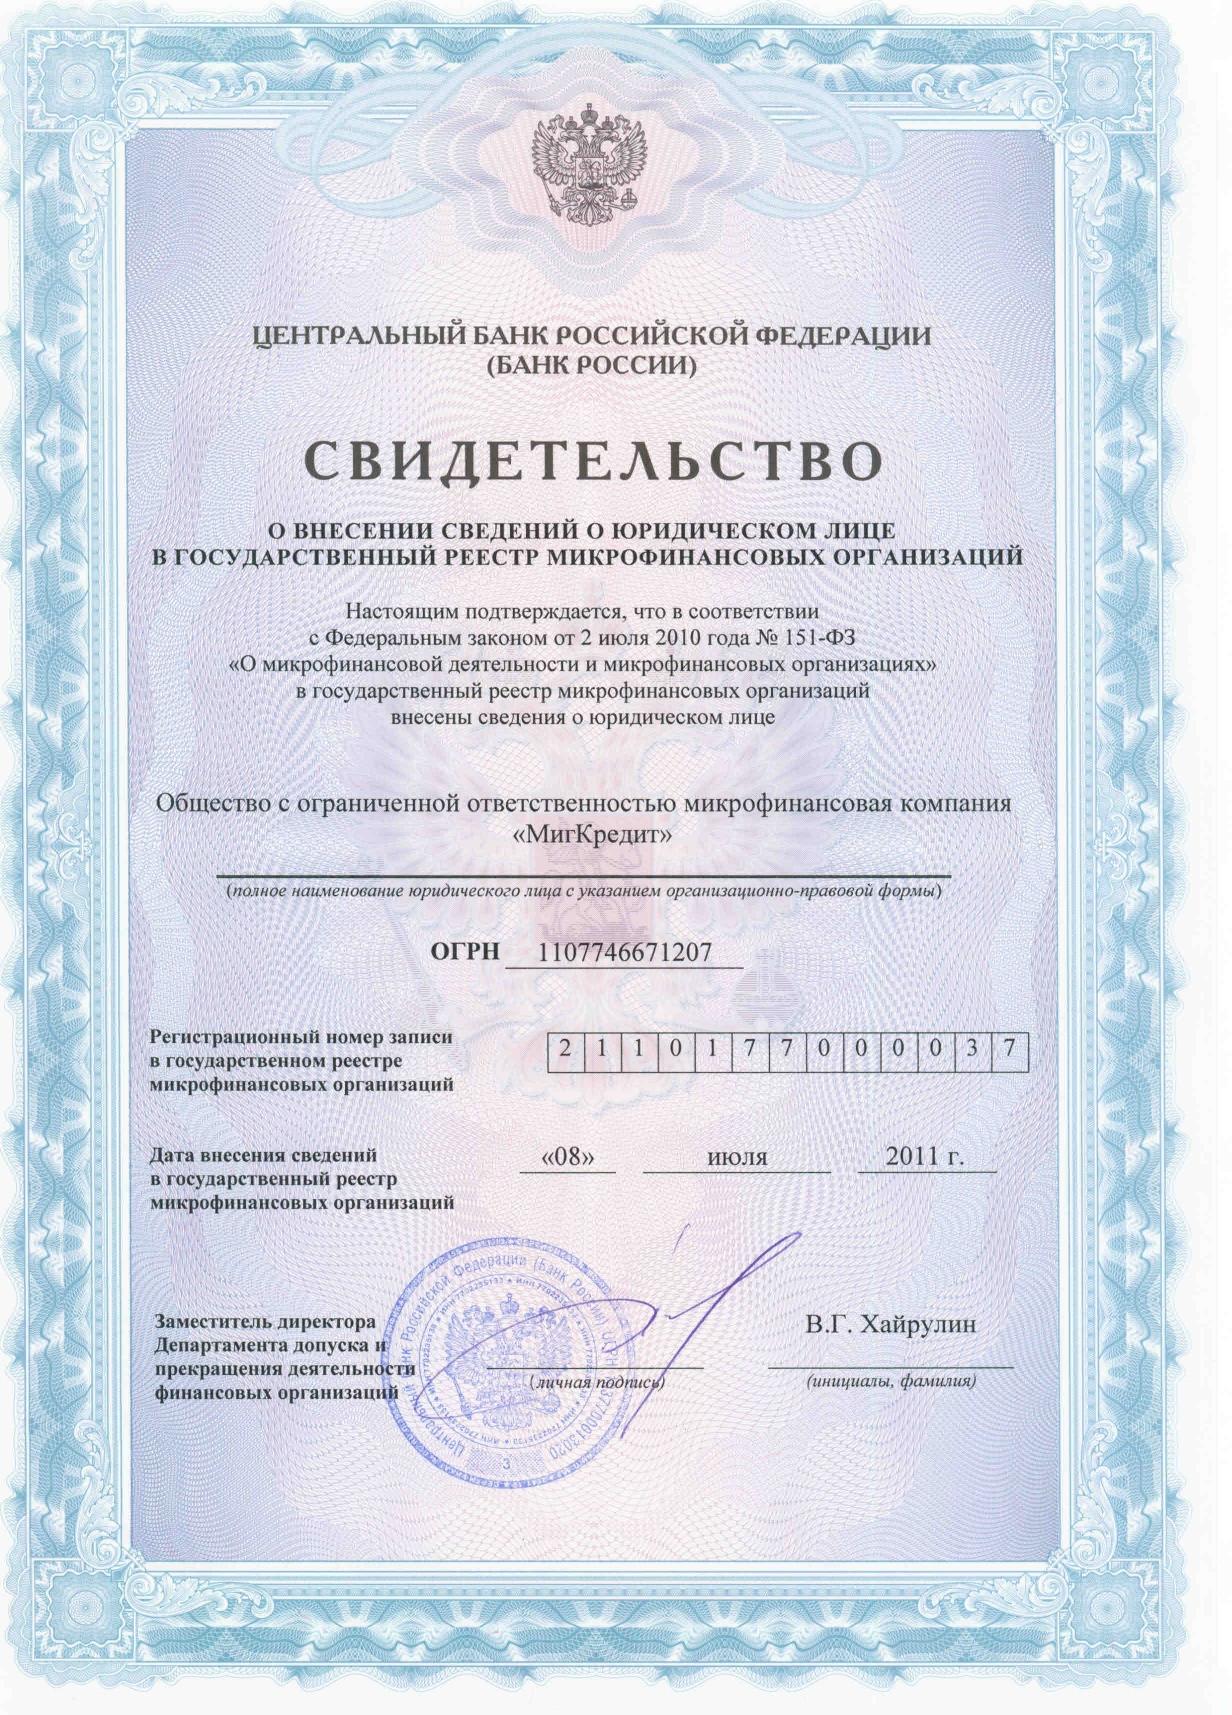 Свидетельство МФО МигКредит